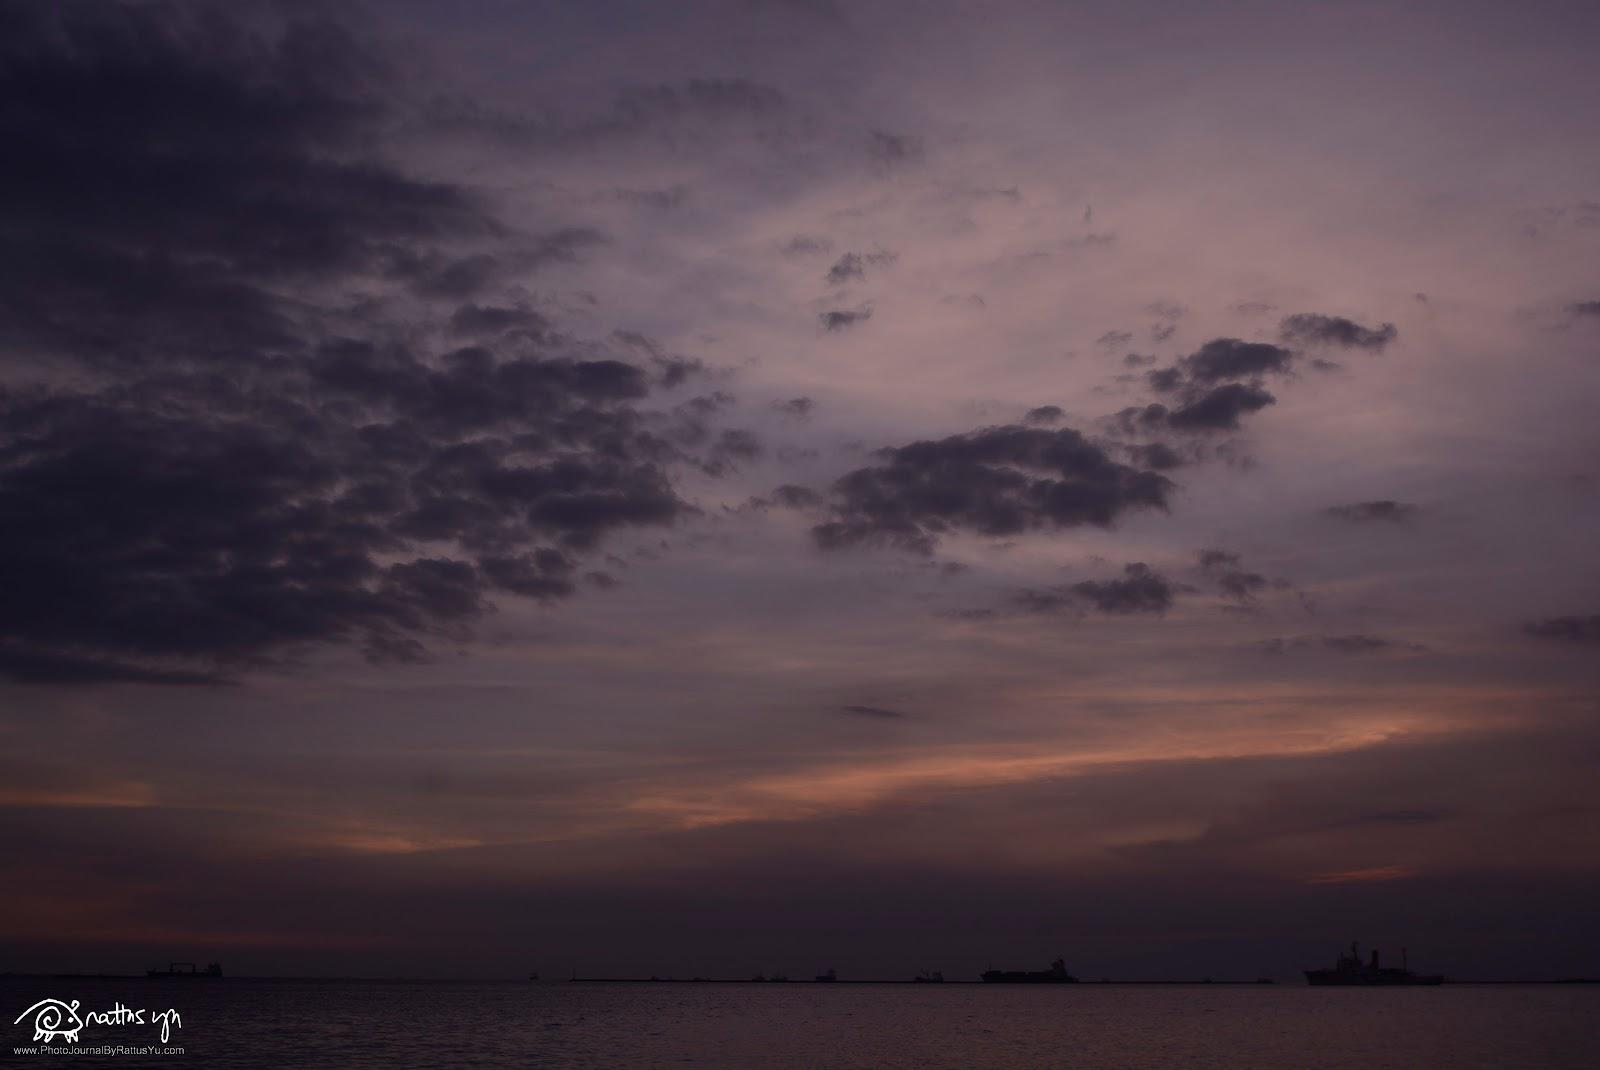 Sunset in Manila Bay featuring Tokina RMC 28mm f/2.8